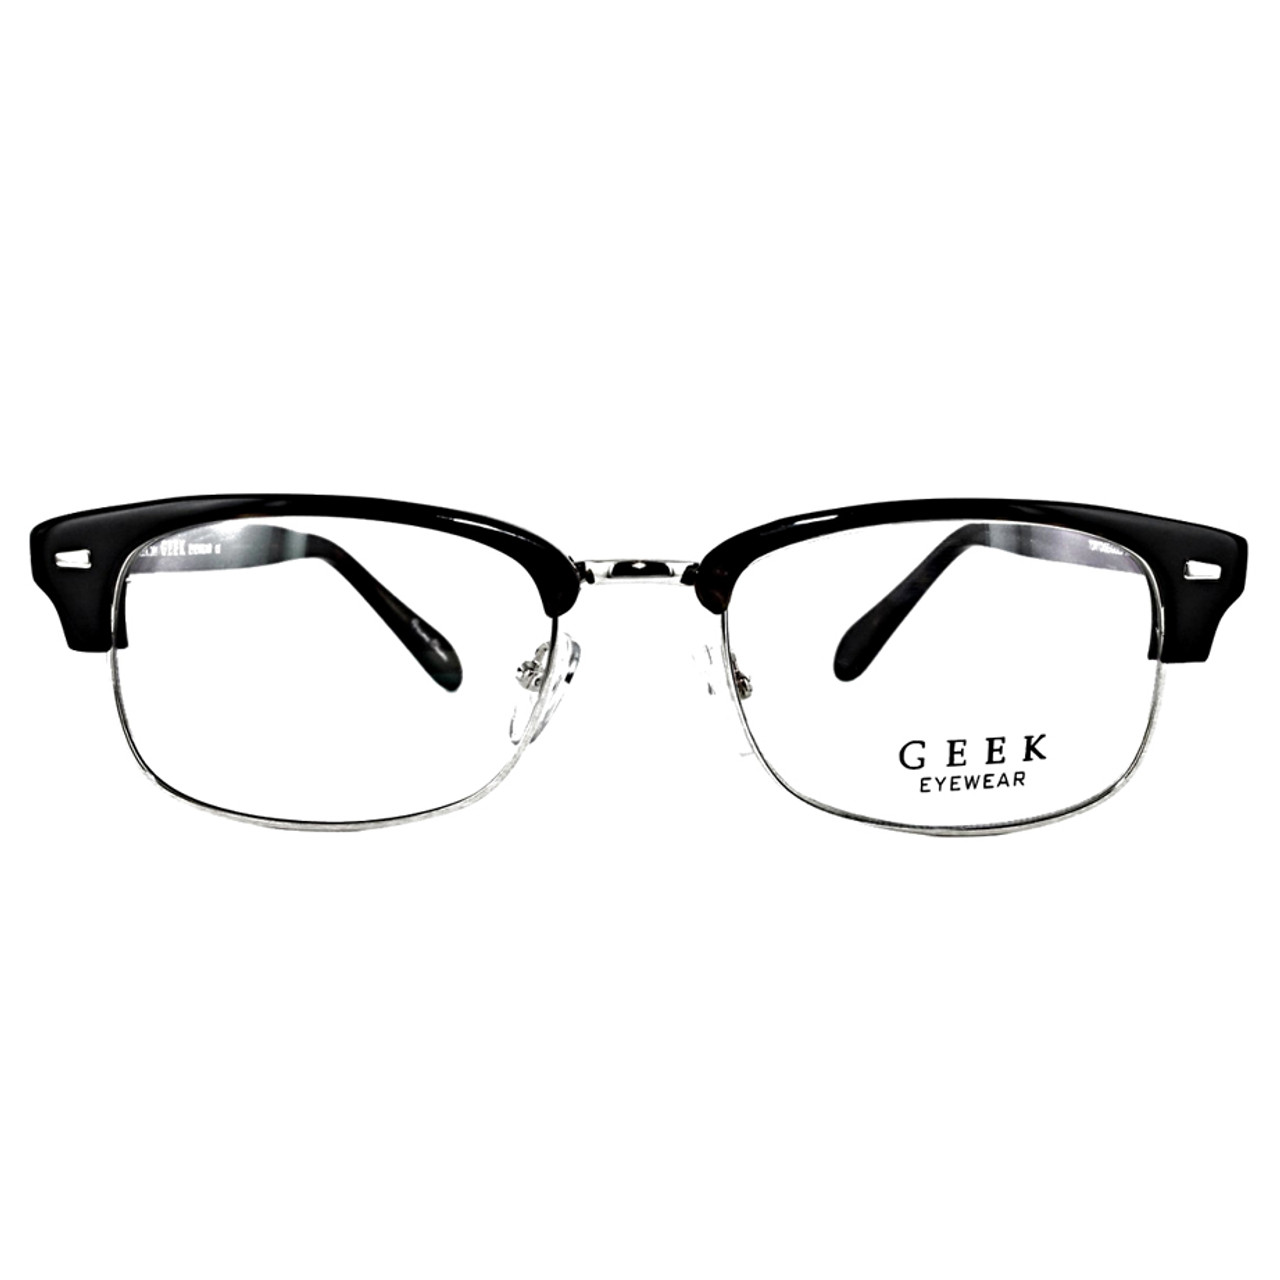 GEEK Eyewear Clubmaster Style 201